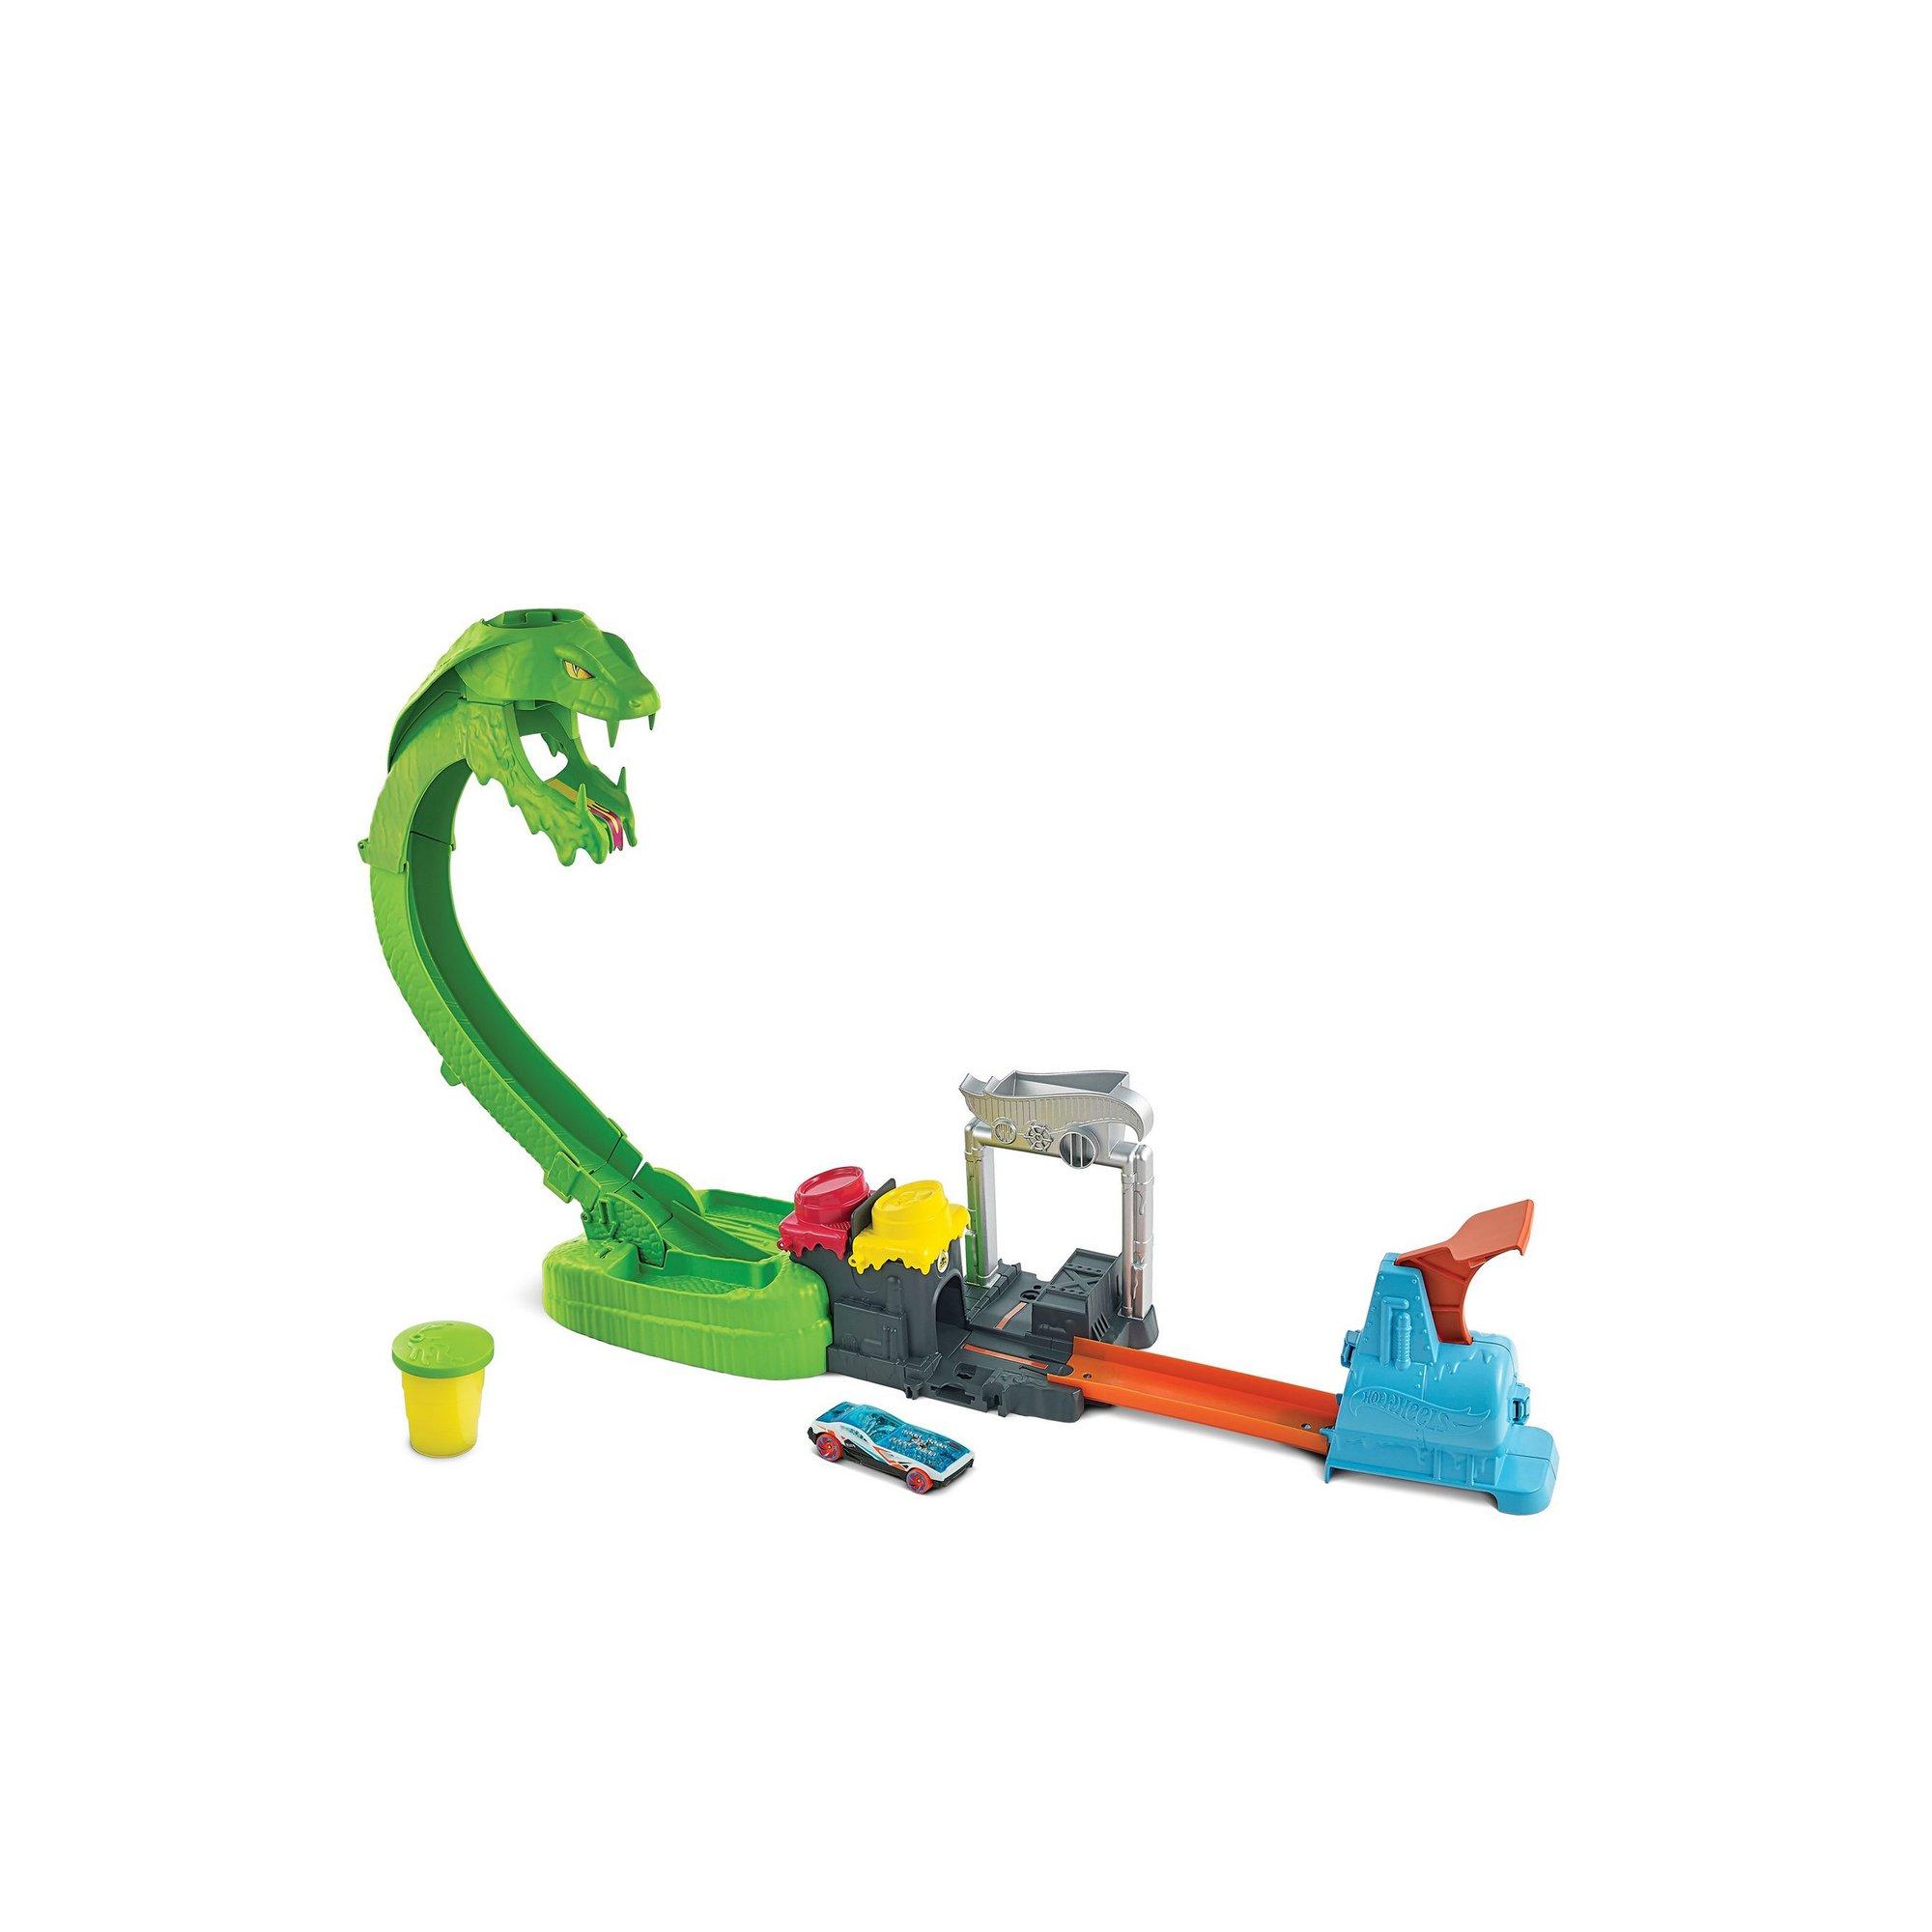 Image of Hot Wheels City Toxic Snake Strike Play Set